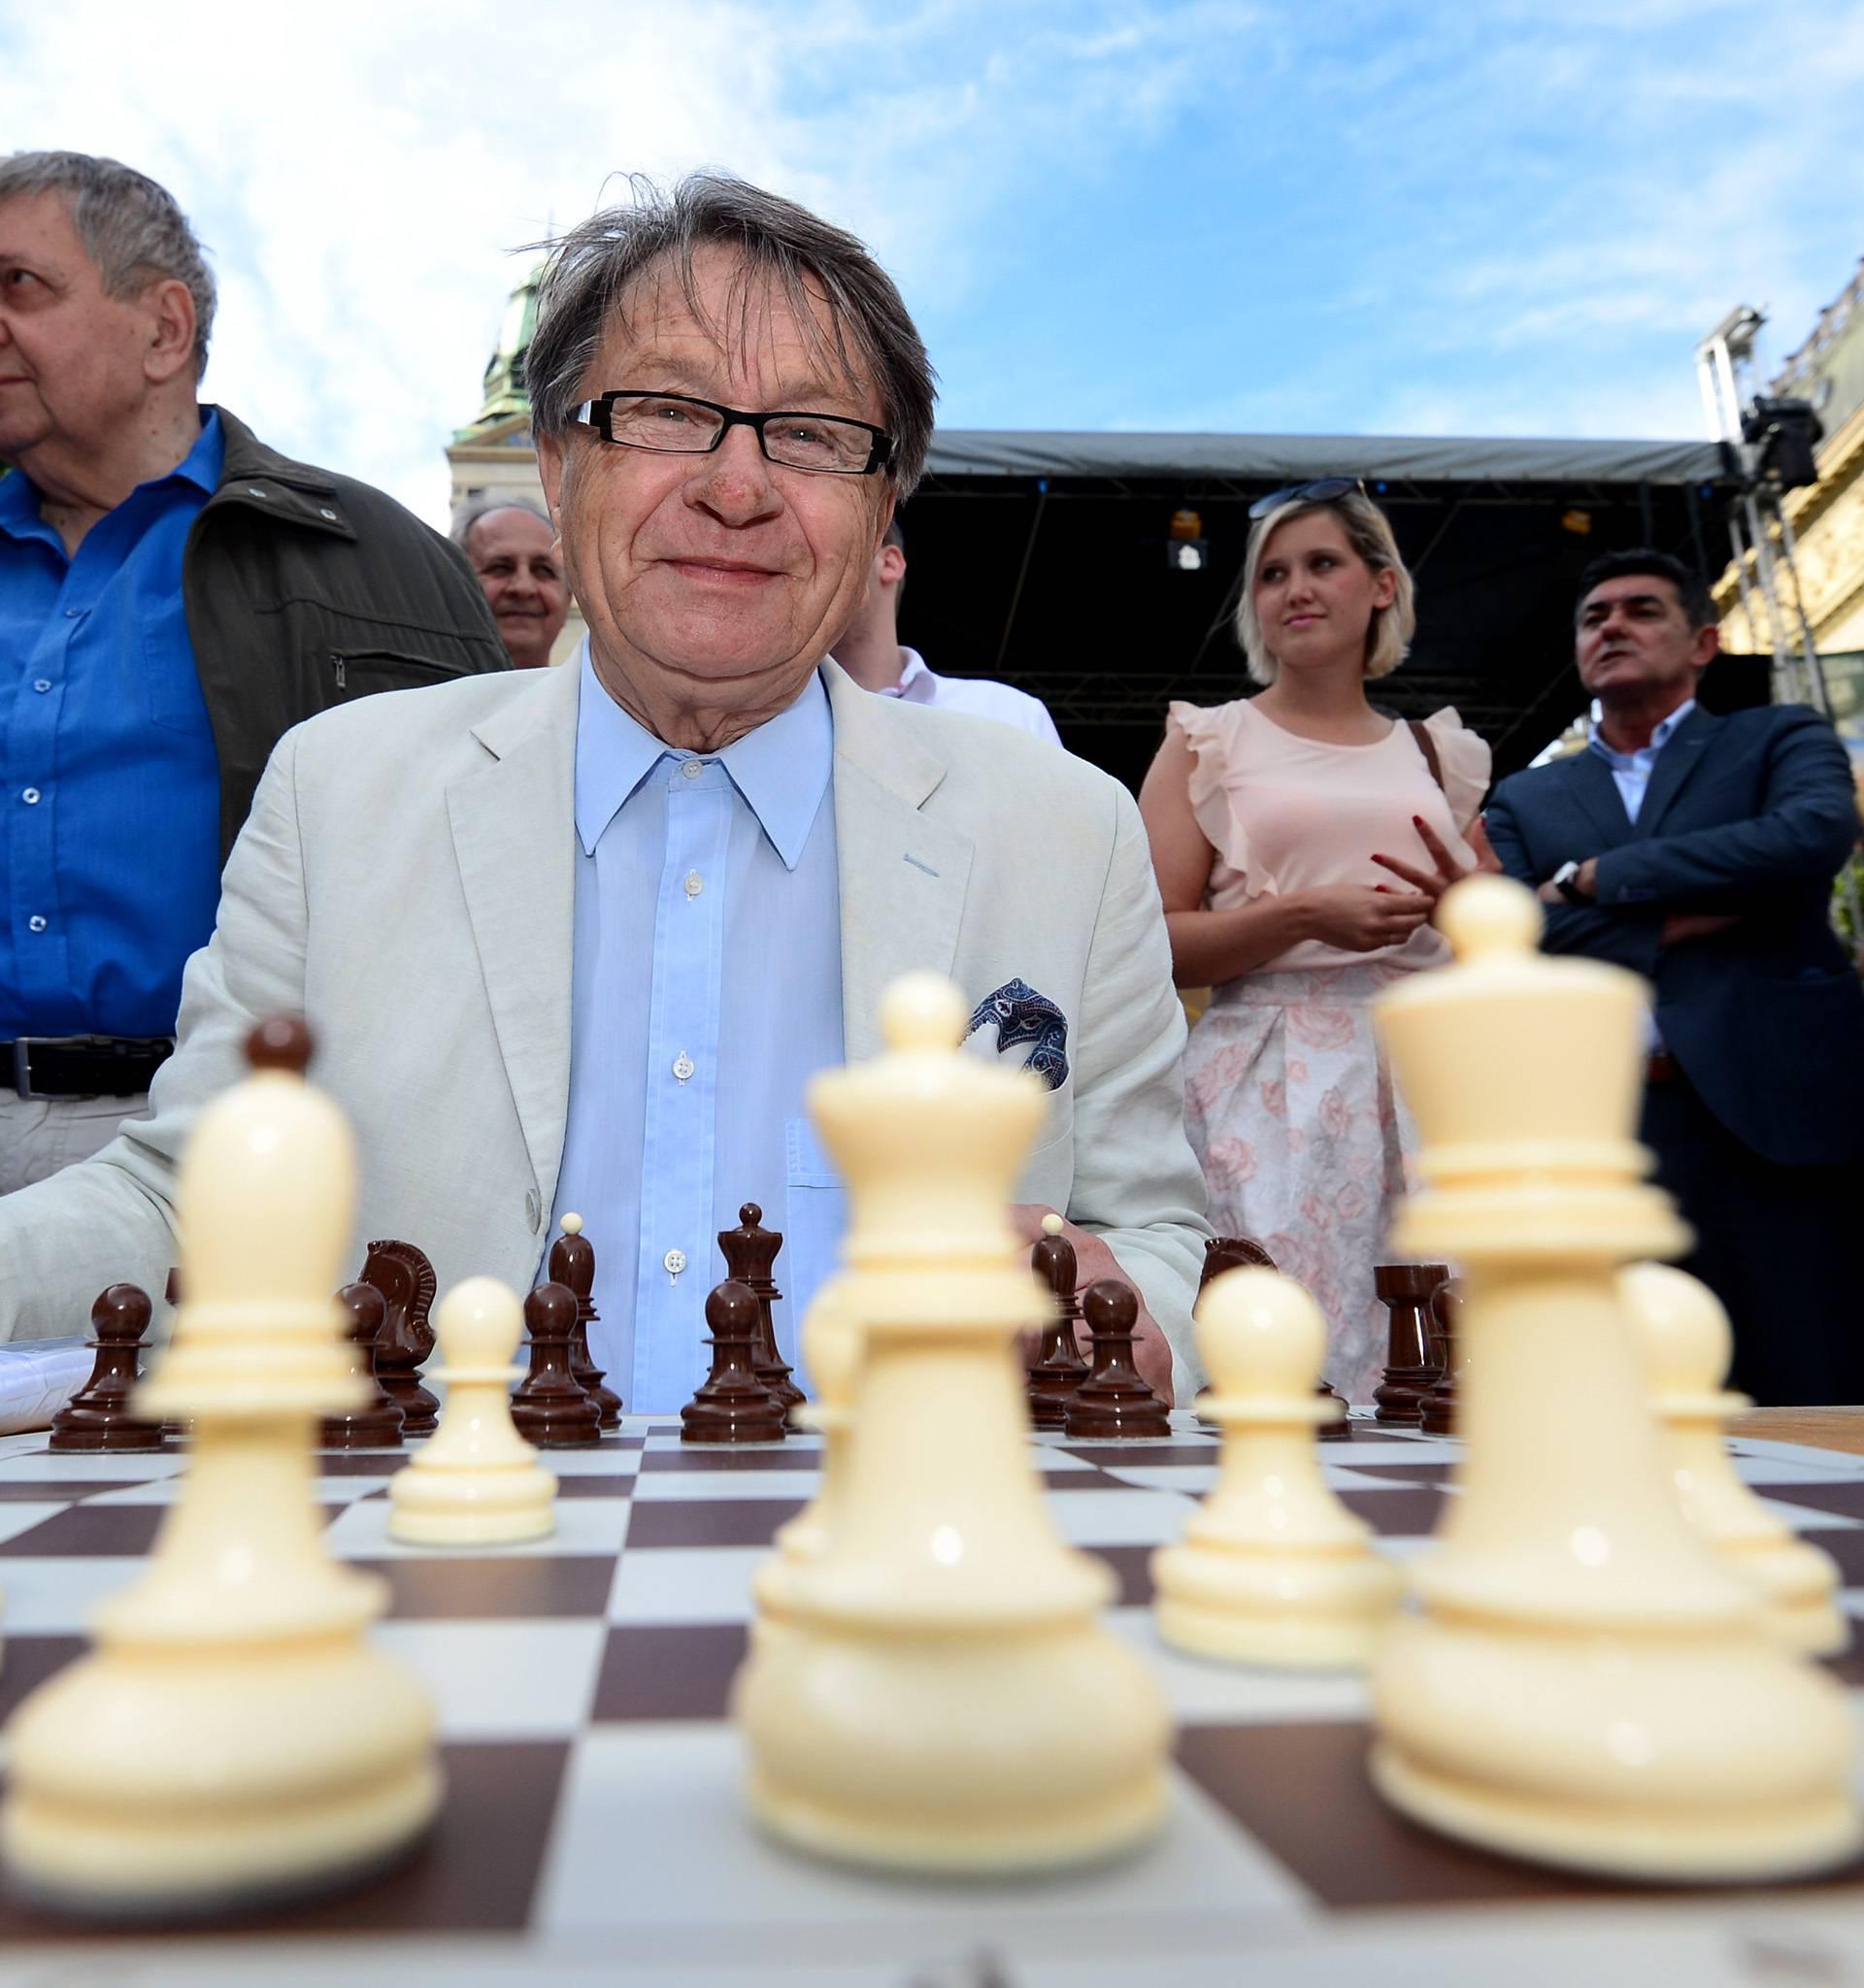 Ćiro-mat protiv Kasparova! Sje*at ću ga, imam taktiku...